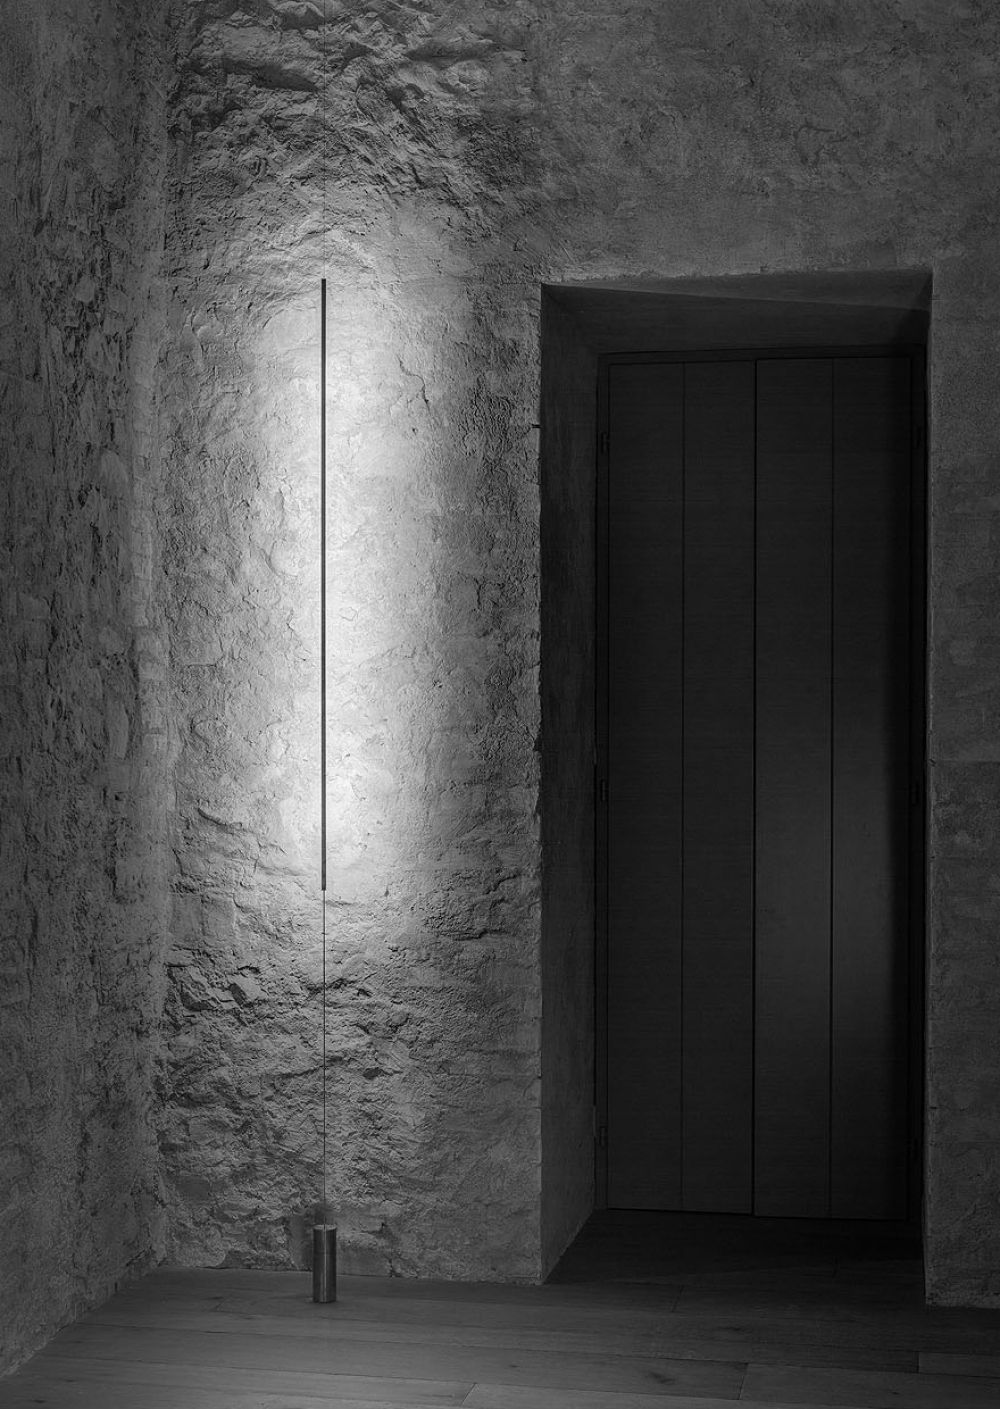 Pin von Marius Kaliga auf led leisten | Pinterest | Design lampen ...